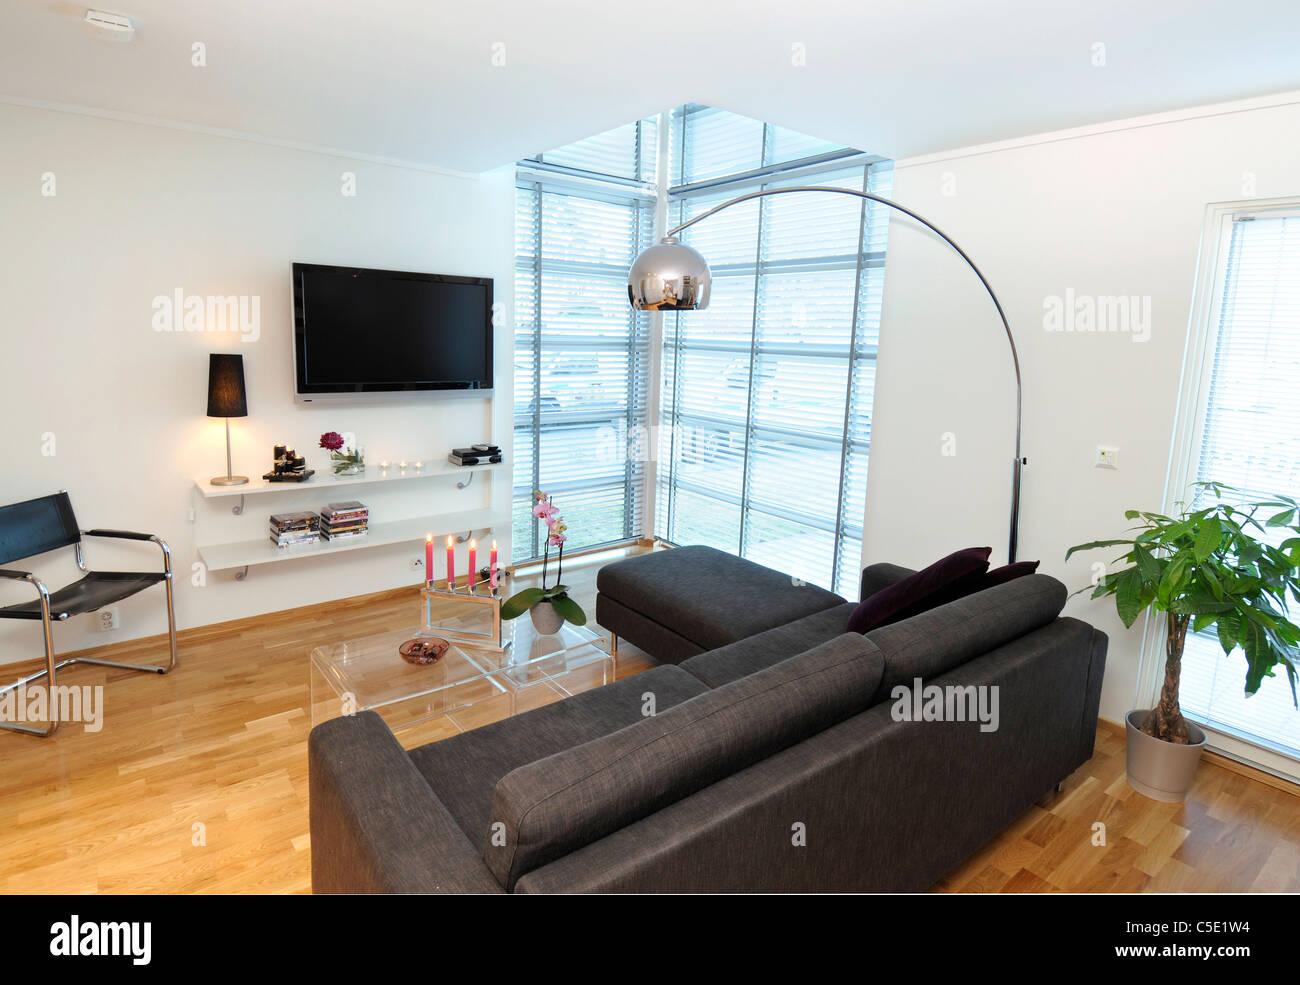 Wondrous View Of Floor Lamp Over Black Sofa Set With Flat Screen Tv Download Free Architecture Designs Scobabritishbridgeorg